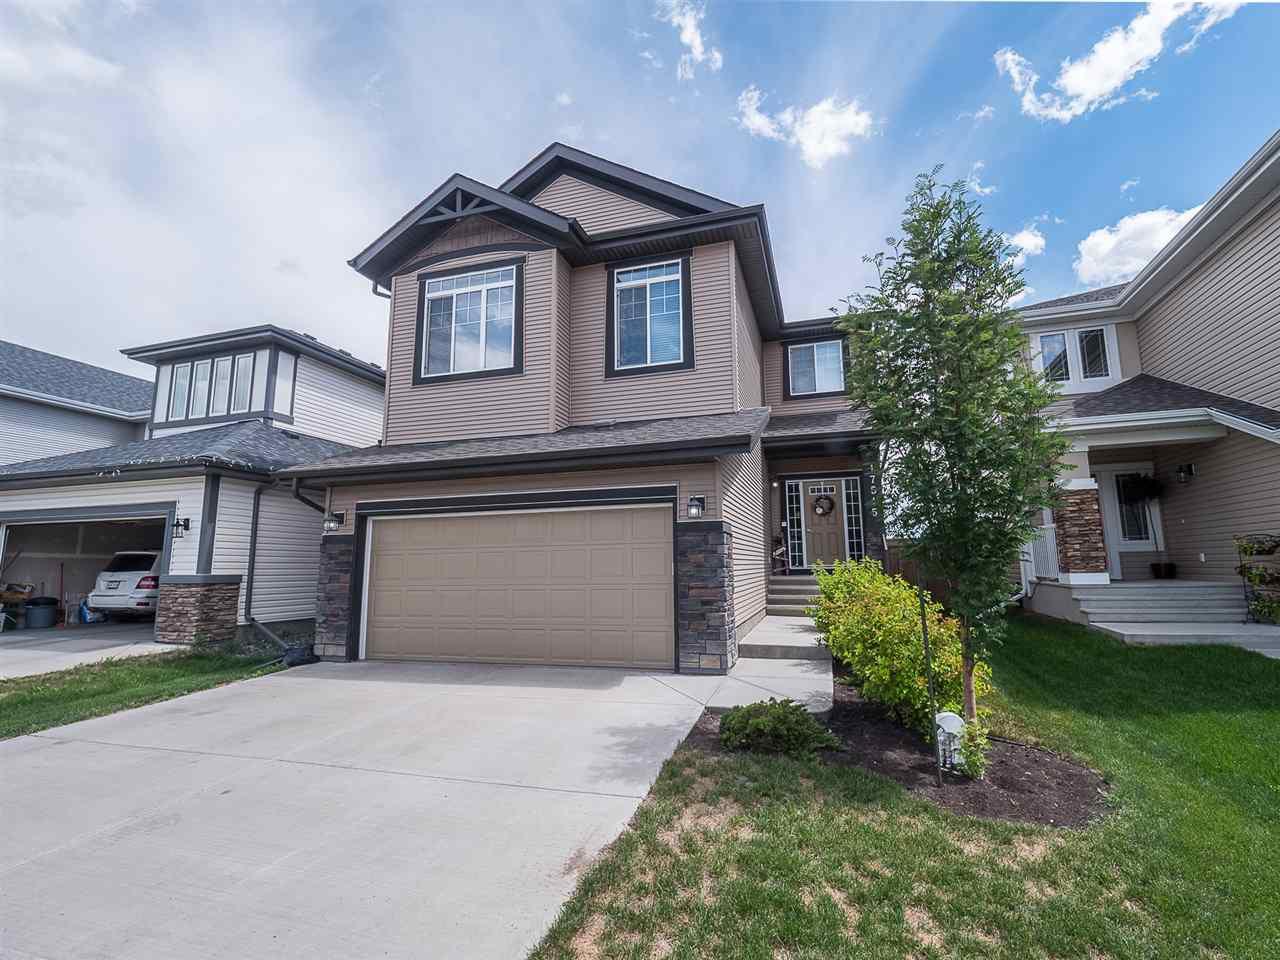 Main Photo: 17515 56 Street in Edmonton: Zone 03 House for sale : MLS®# E4144105